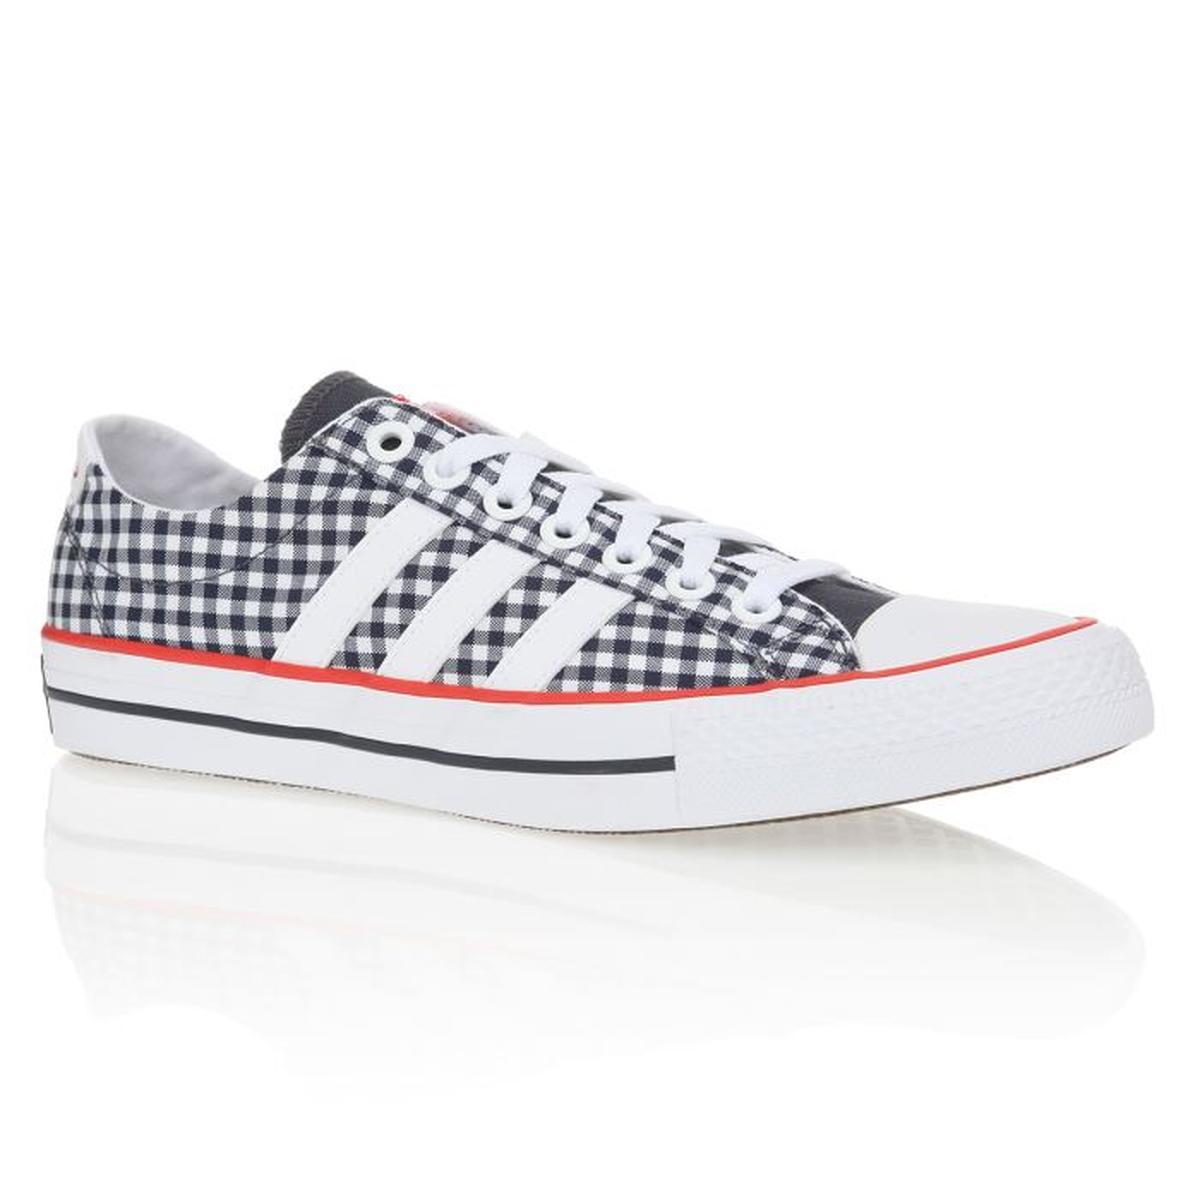 210716b15b5da adidas baskets neo 3 stripes lo homme brwlmabhkl